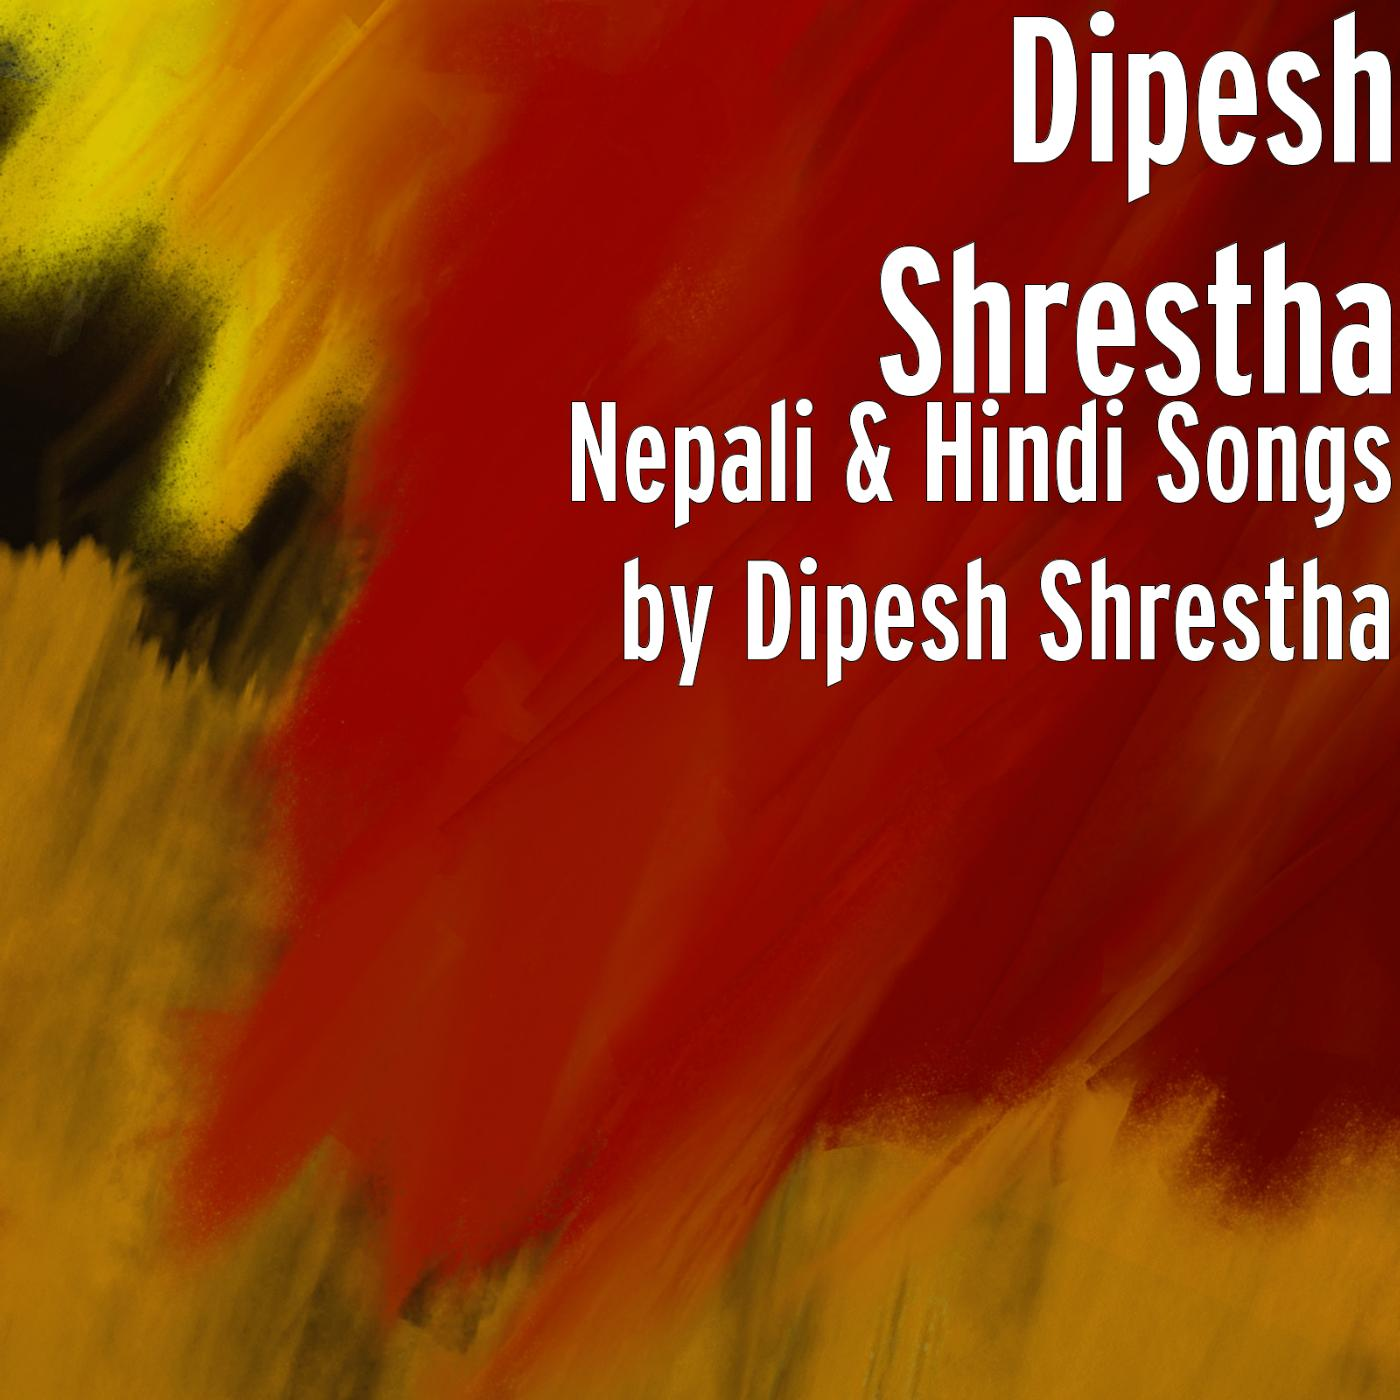 Listen free to dipesh shrestha kalo gajal radio iheartradio kalo gajal thecheapjerseys Image collections